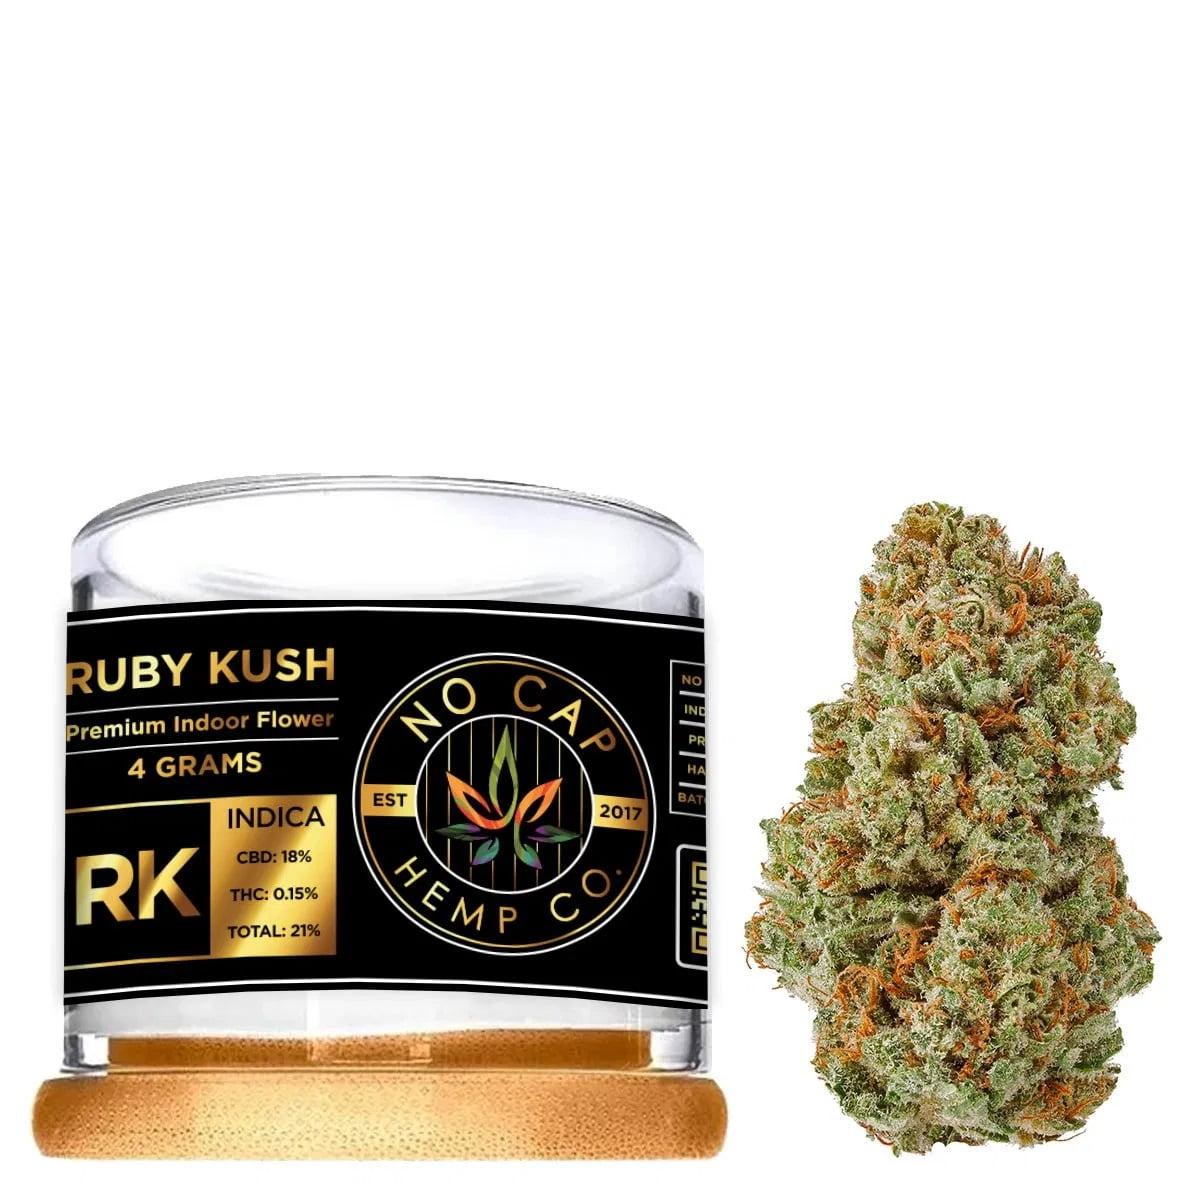 NoCap Ruby Kush 4grams